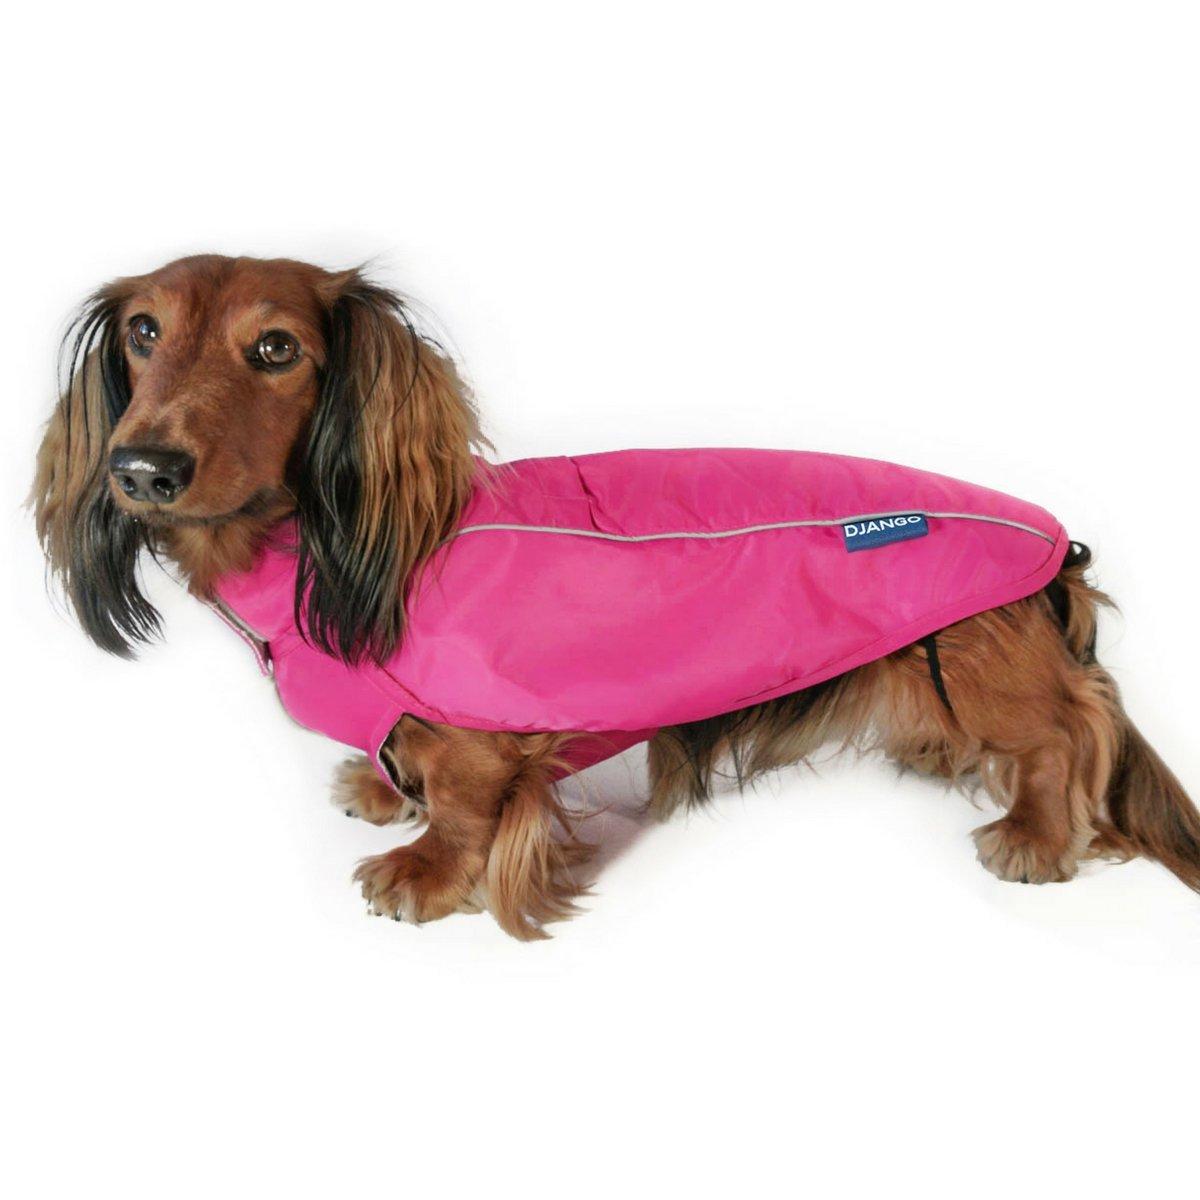 Cerise Pink XSDJANGO City Slicker WaterRepellent Dog Raincoat and AllWeather Jacket with Reflective Piping (Medium, Cherry Red)